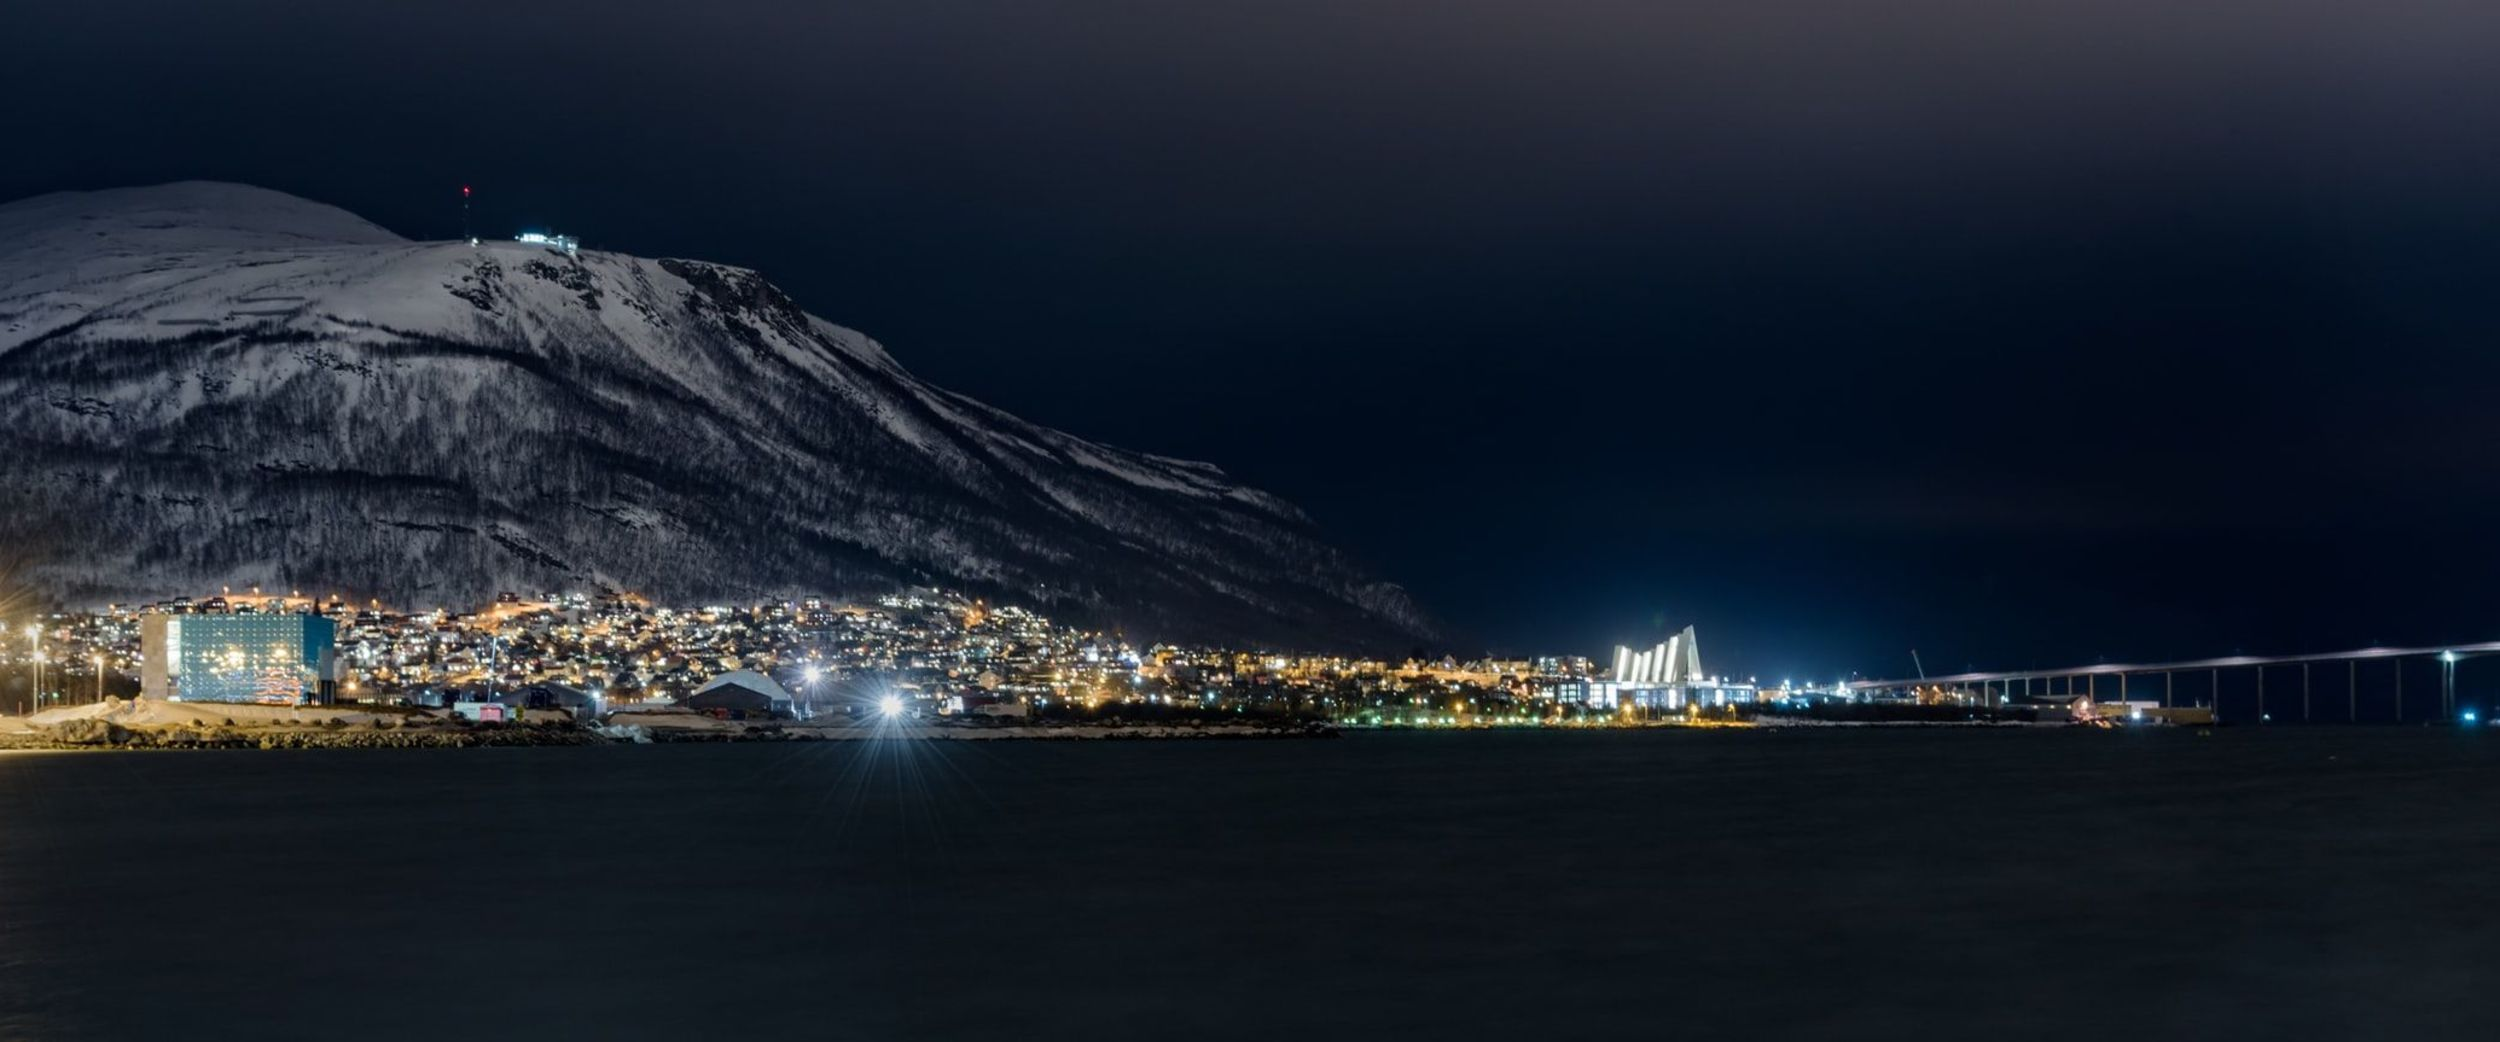 Tromsø in the night with Ishavskatedralen. Photo: Ludovic Charlet, Unsplash